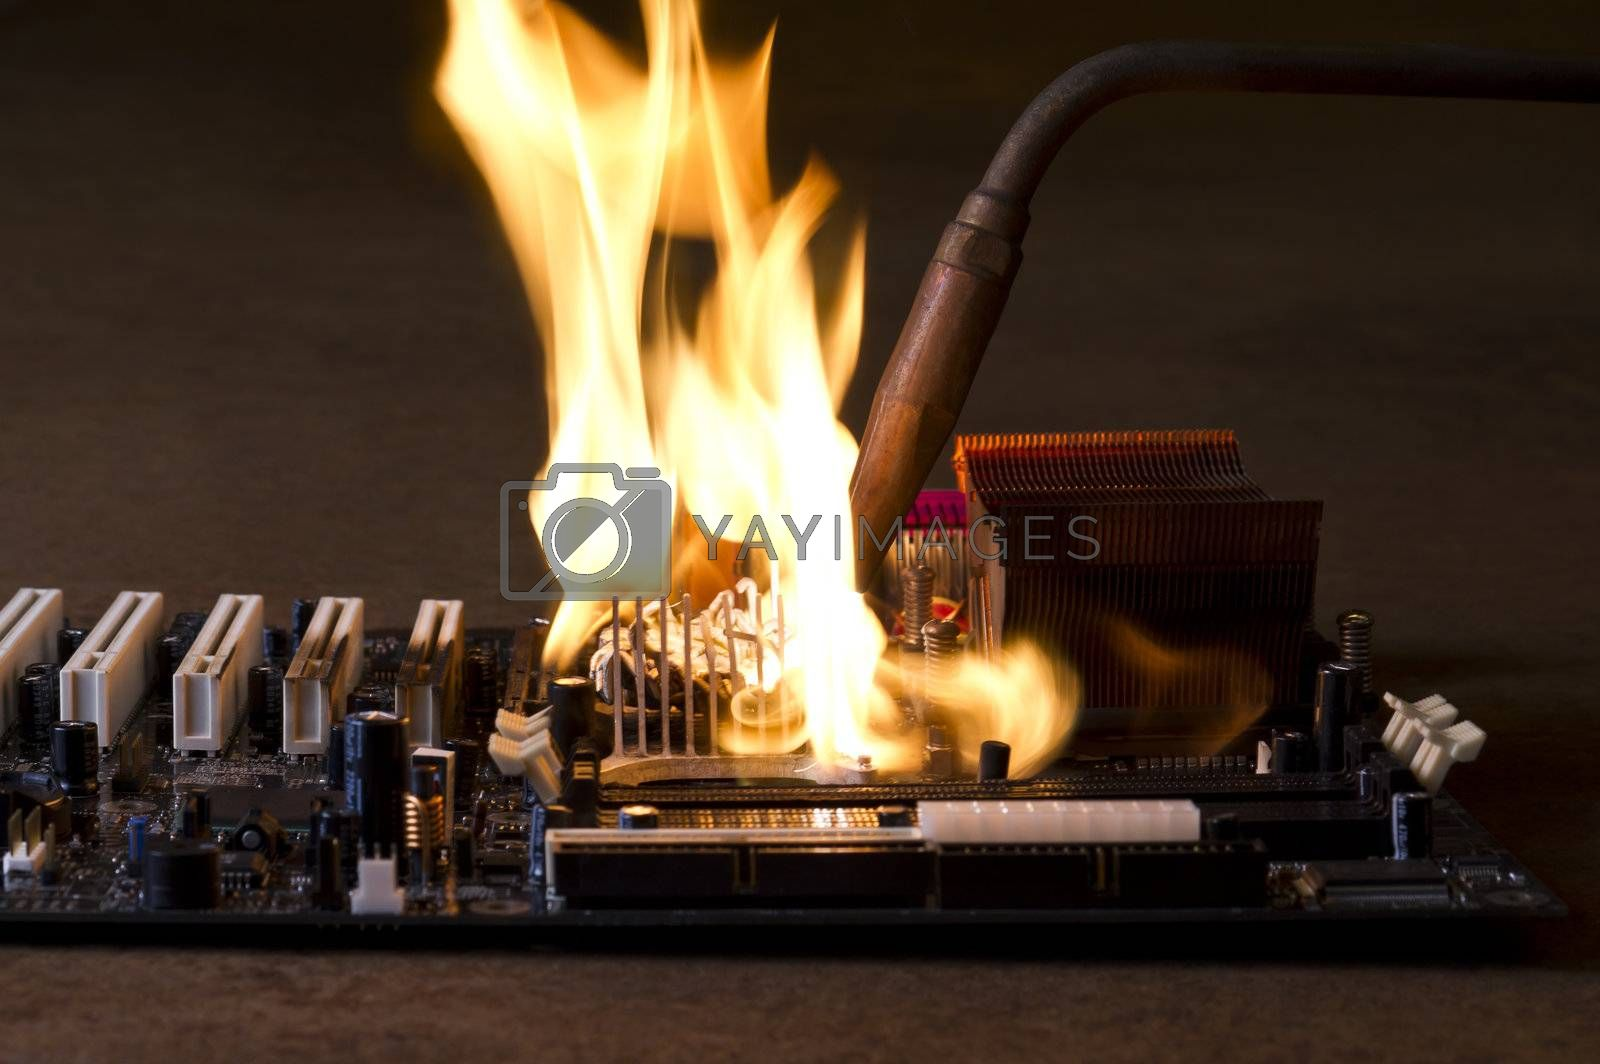 burning computer main board in rusty background. Copyspace